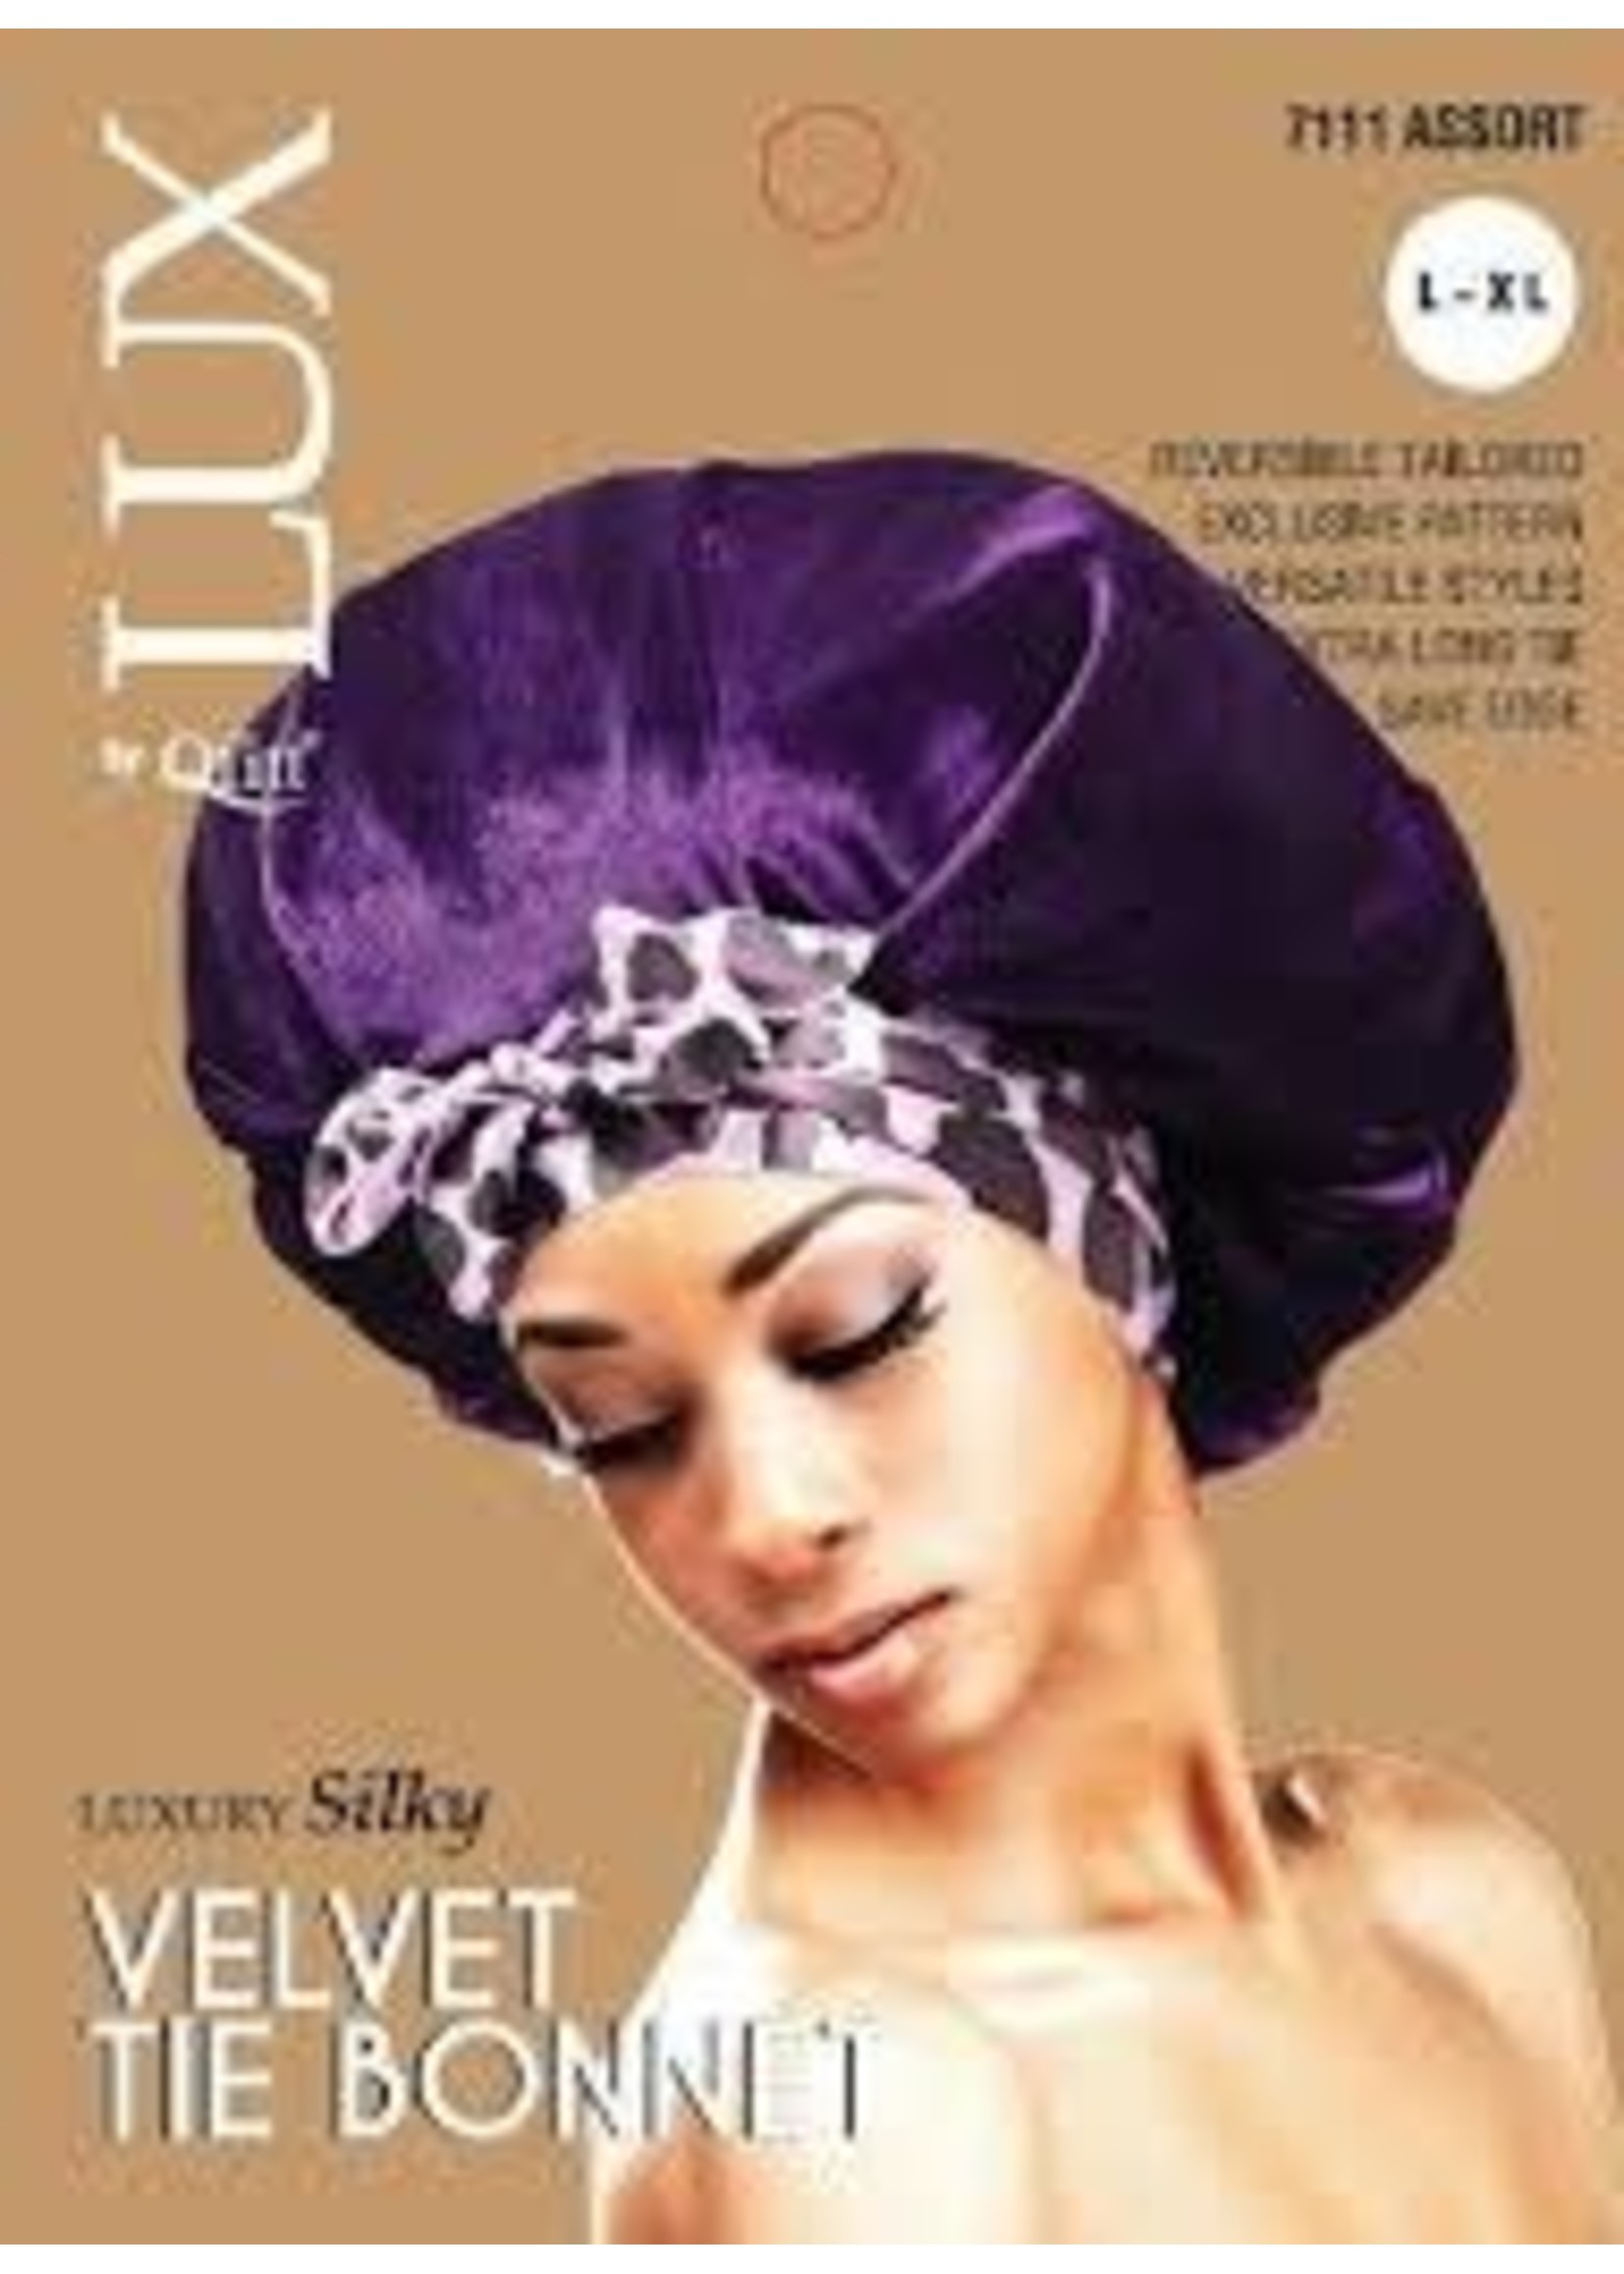 Lux Luxury Silky Velvet Tie Bonnet L-XL